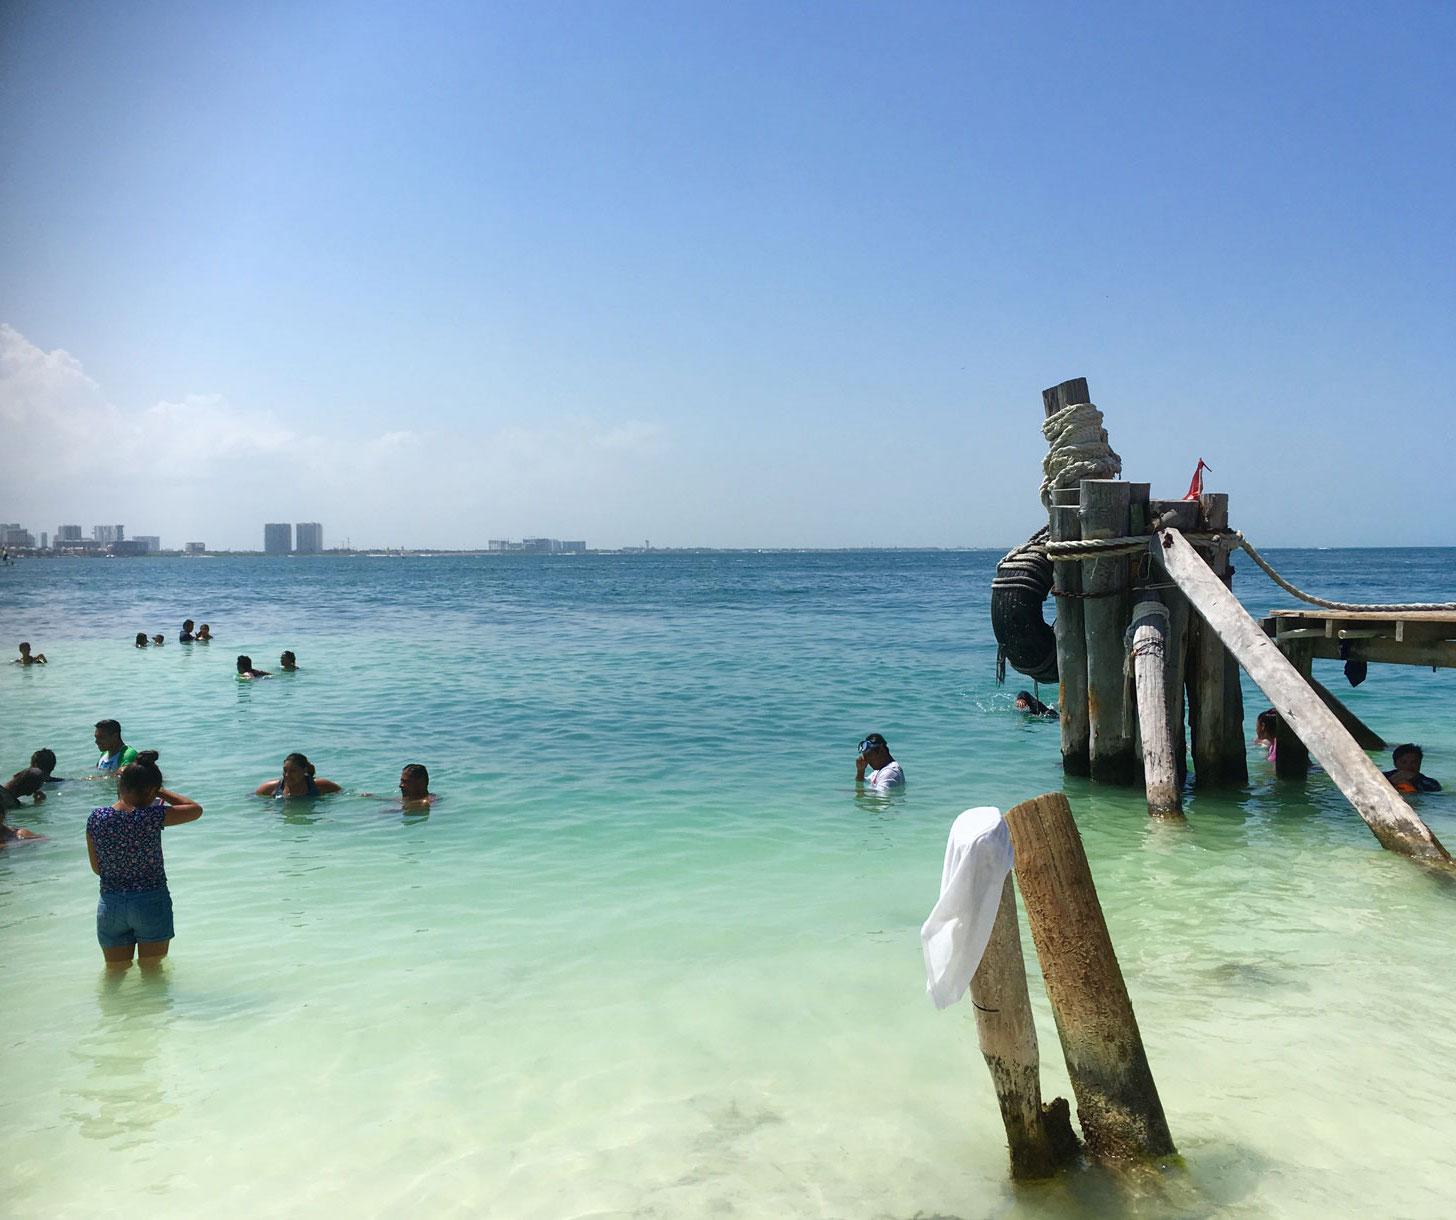 Hammocks_and_Ruins_Blog_Riviera_Maya_Mexico_Travel_Discover_Explore_Yucatan_Hammocks_Beaches_Near_Cancun_Playa_Linda_16.jpg